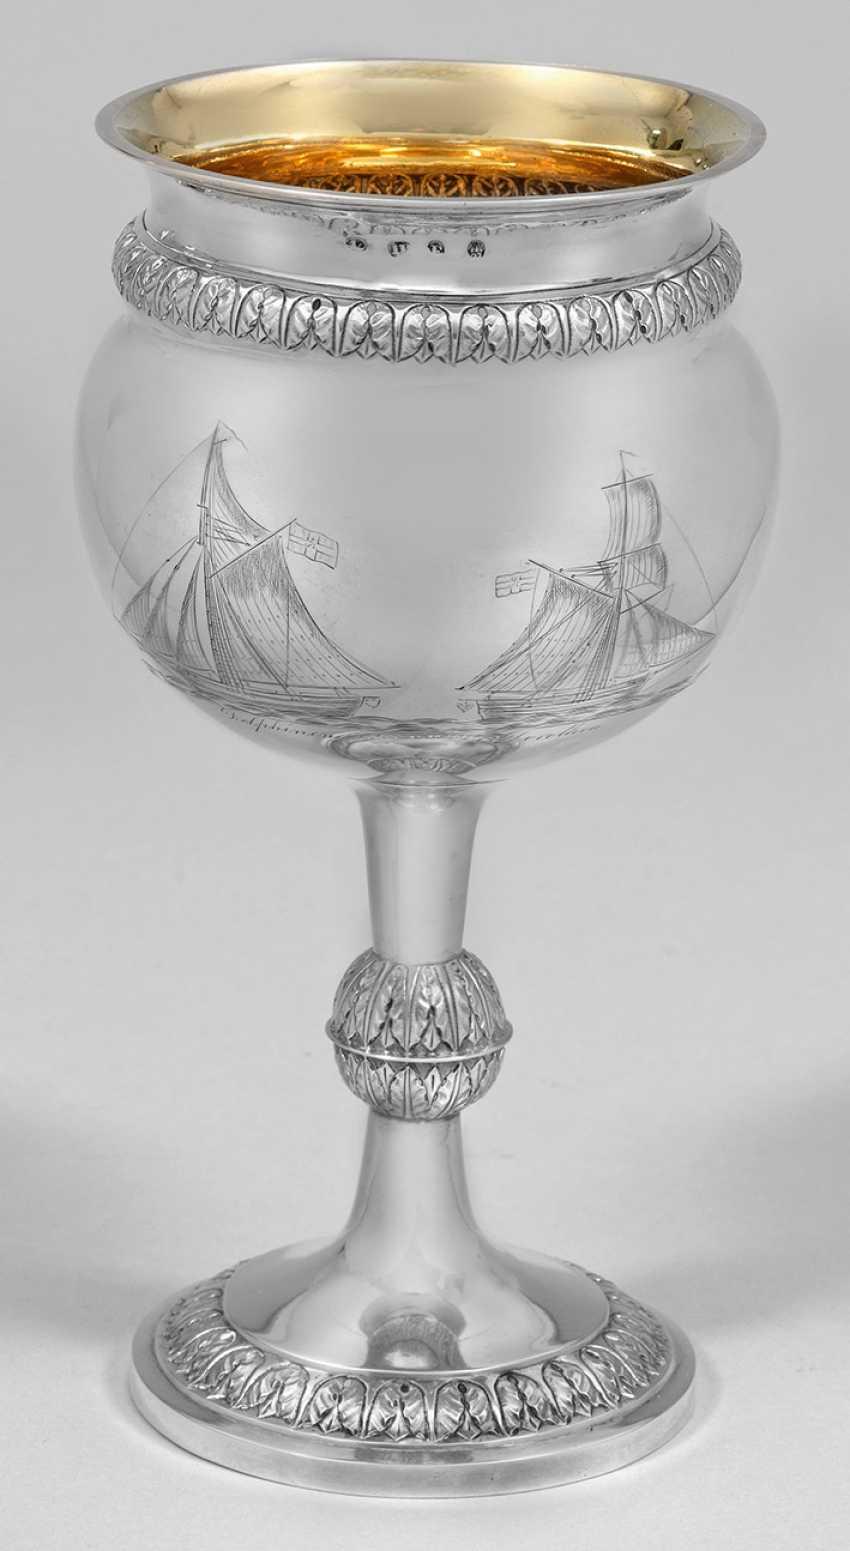 Biedermeier Cup on the Maritime trade - photo 1